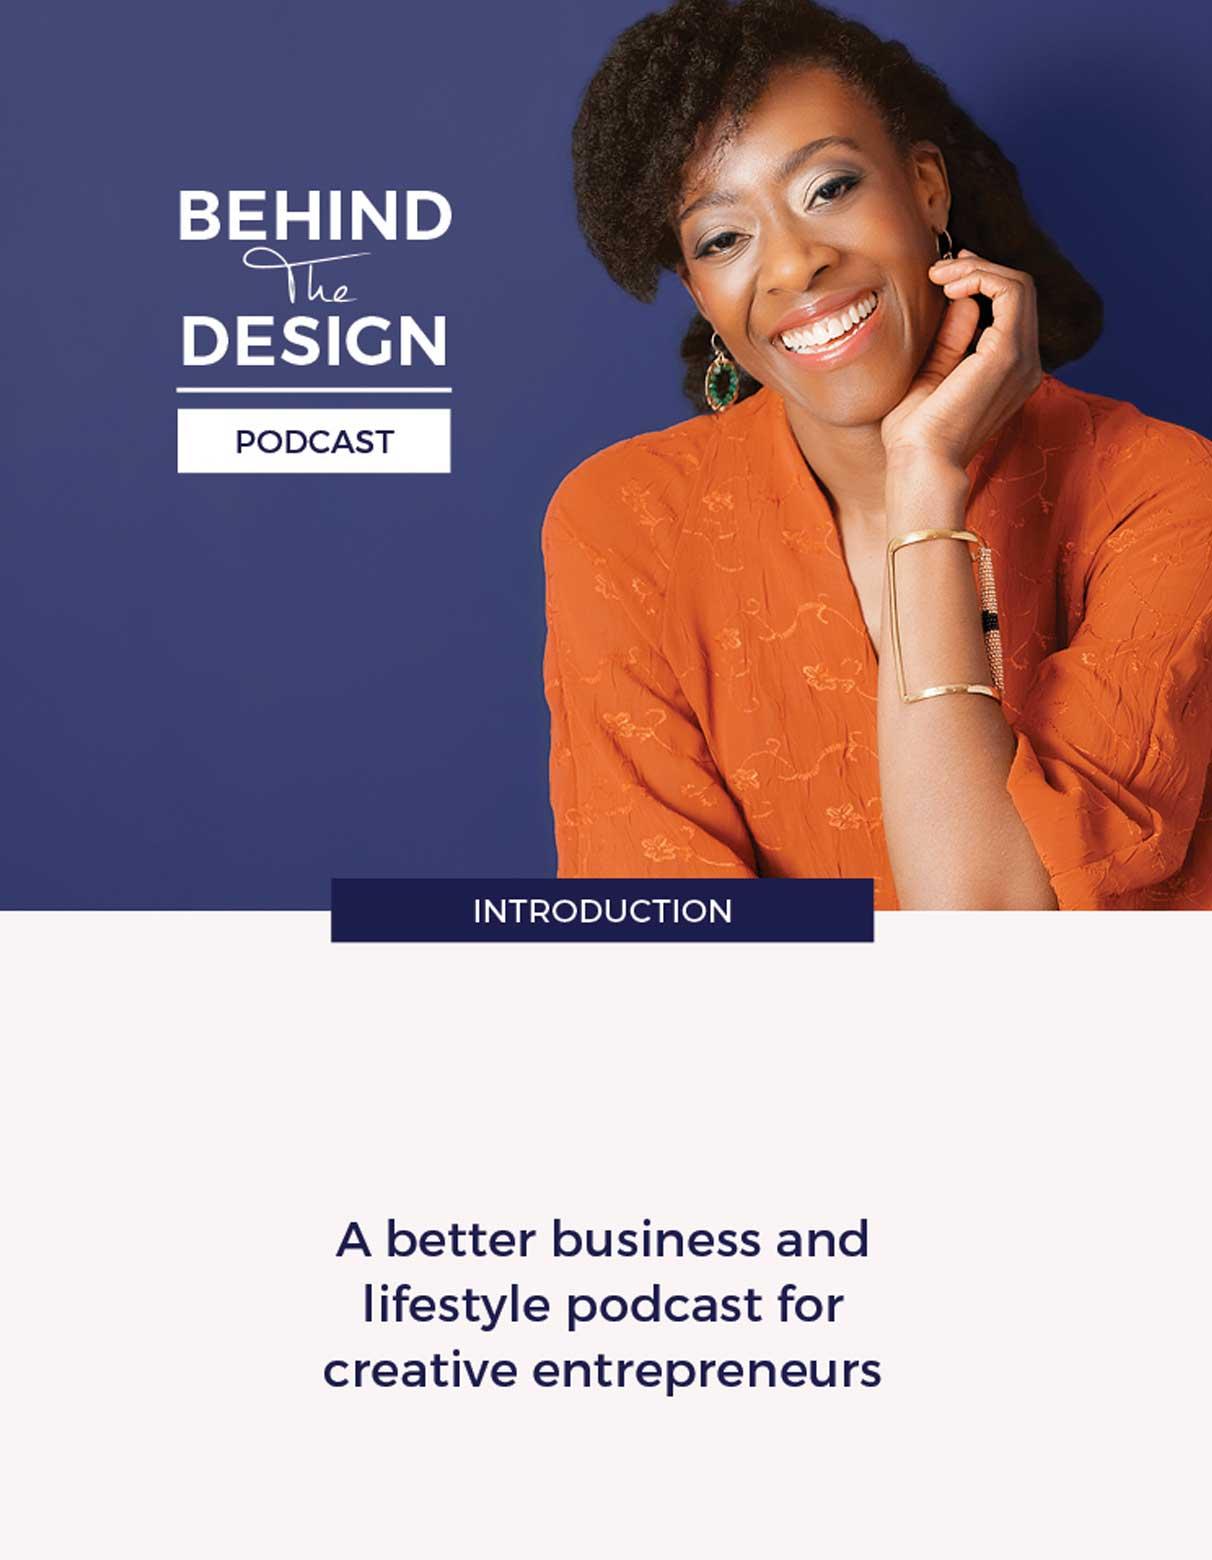 Behind The Design Podcast Hosted by Tapiwa Matsinde